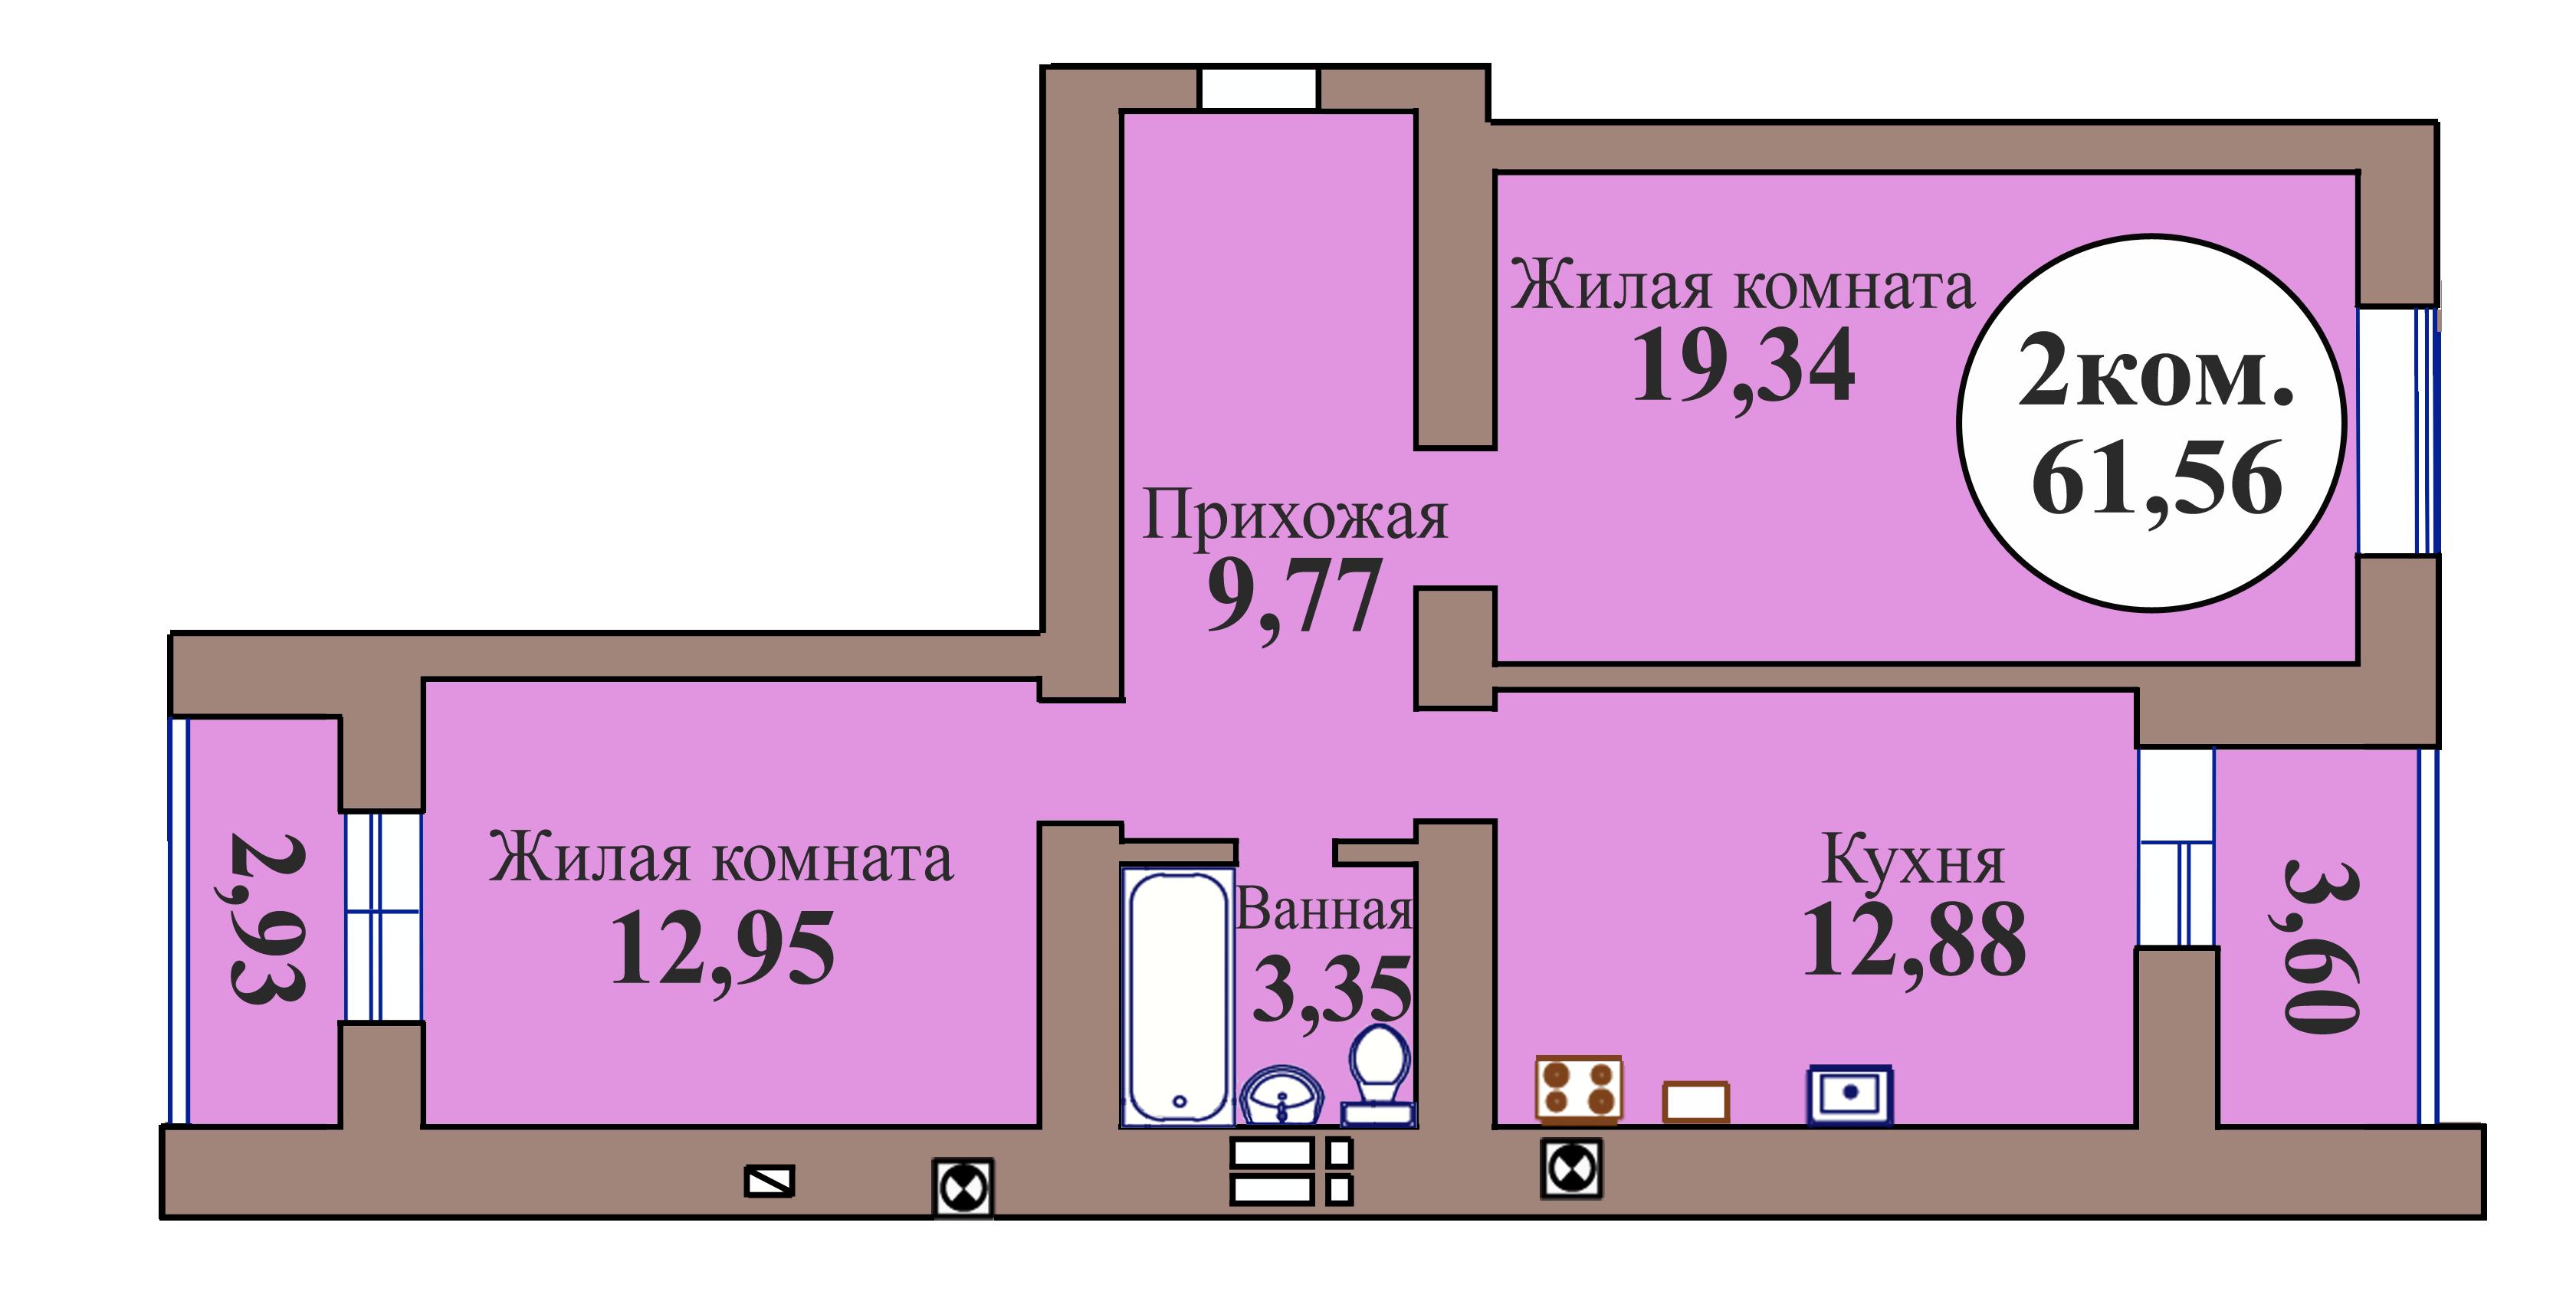 2-комн. кв. по пер. Калининградский, 5 кв. 107 в Калининграде